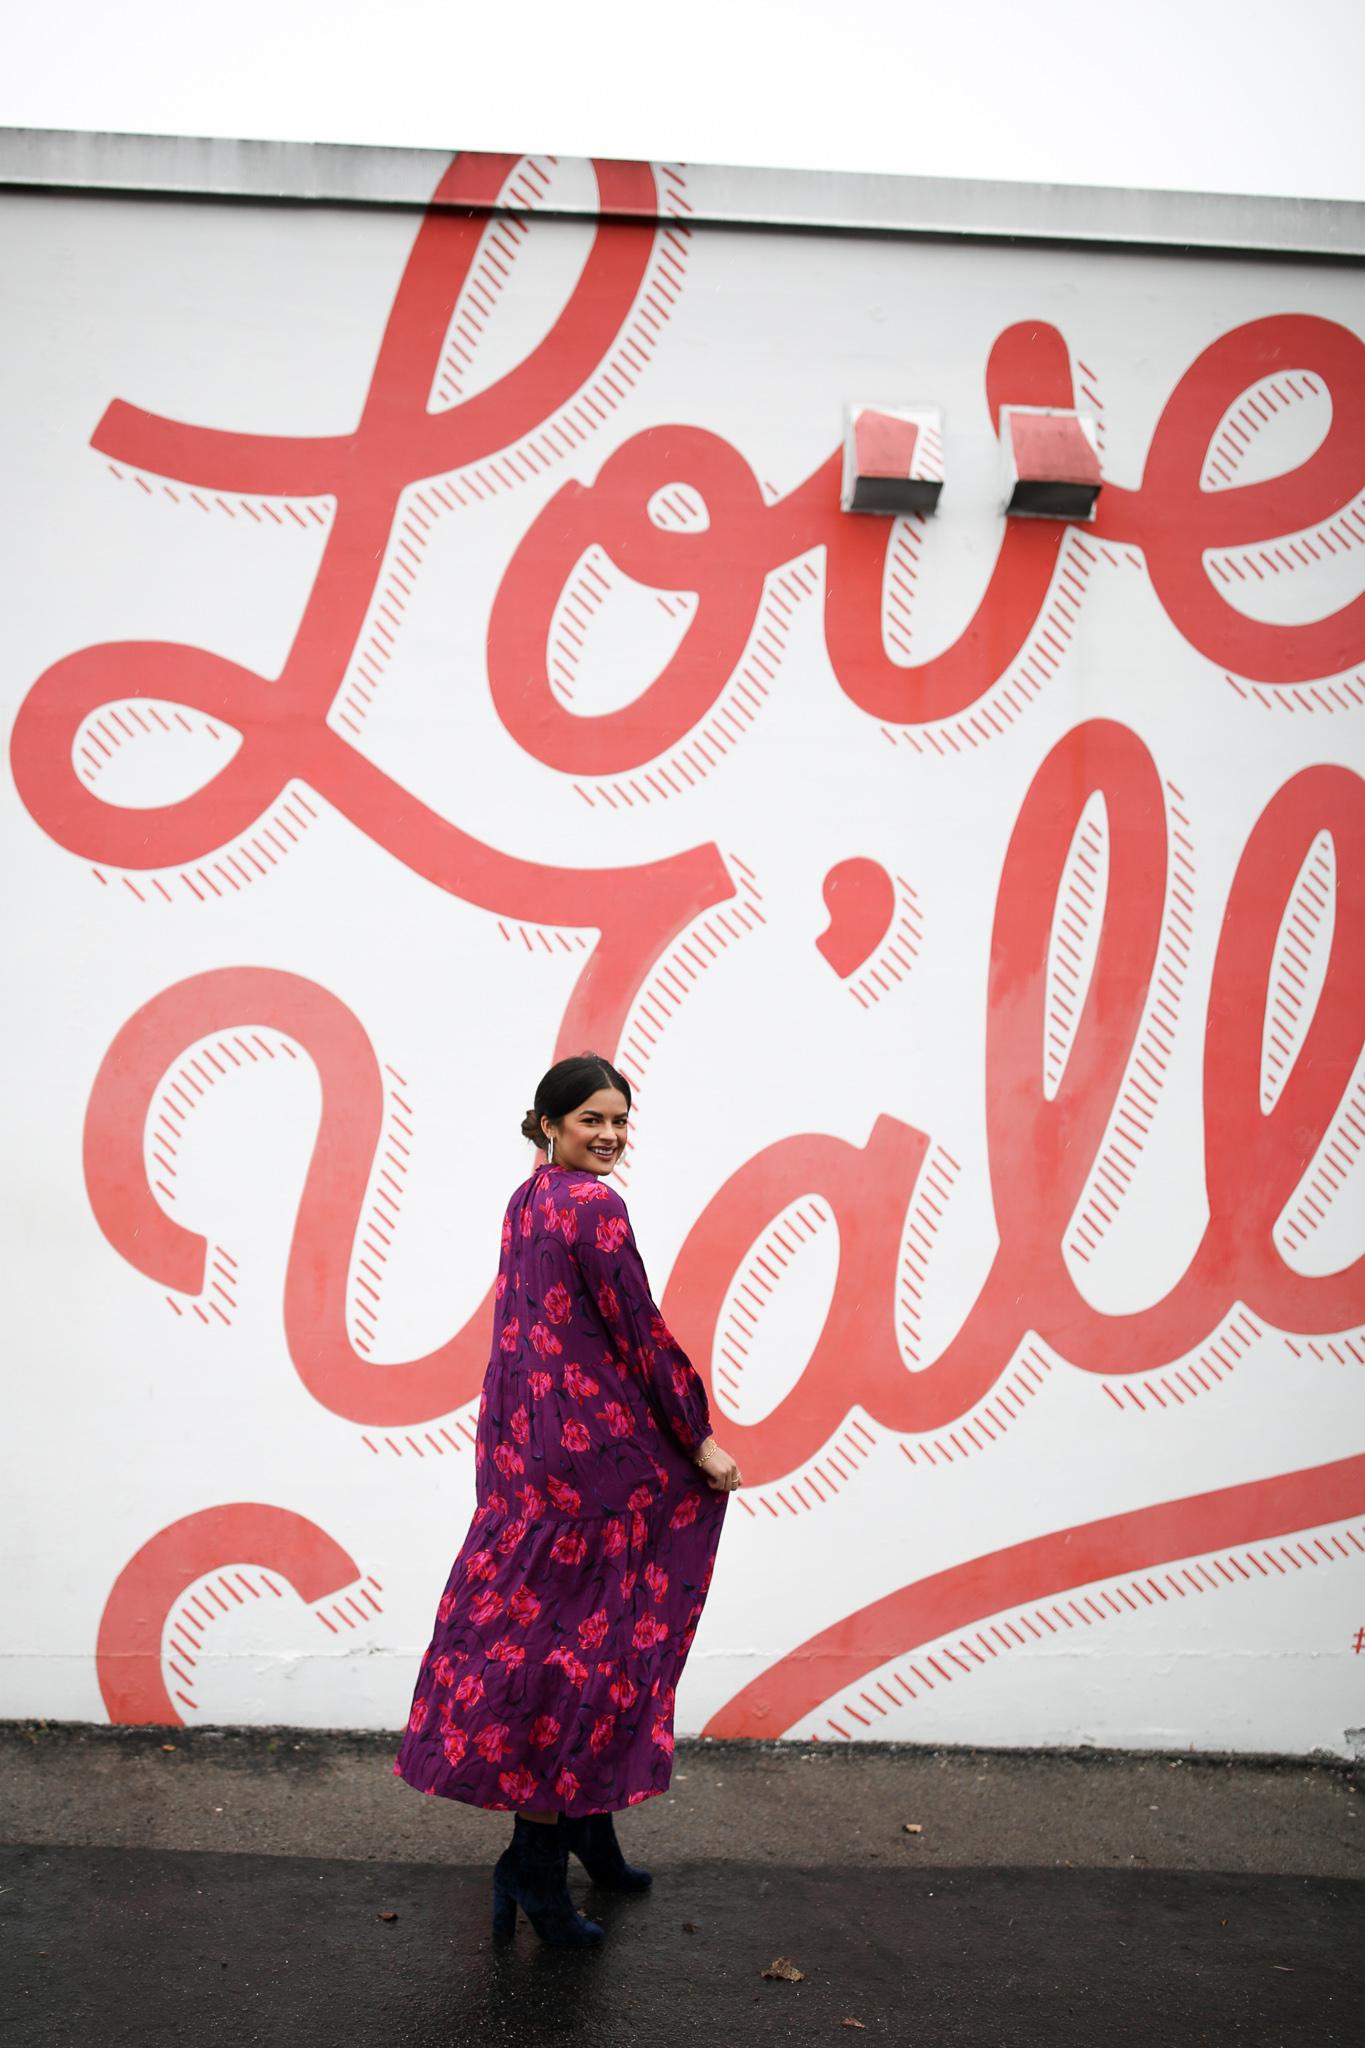 Priya the Blog, Nashville fashion blog, Nashville fashion blogger, Nashville style blog, Nashville style blogger, teddy coat, how to style a teddy coat, blue velvet booties, how to style blue velvet booties, long boho dress, Winter fashion, Winter outfit ideas,